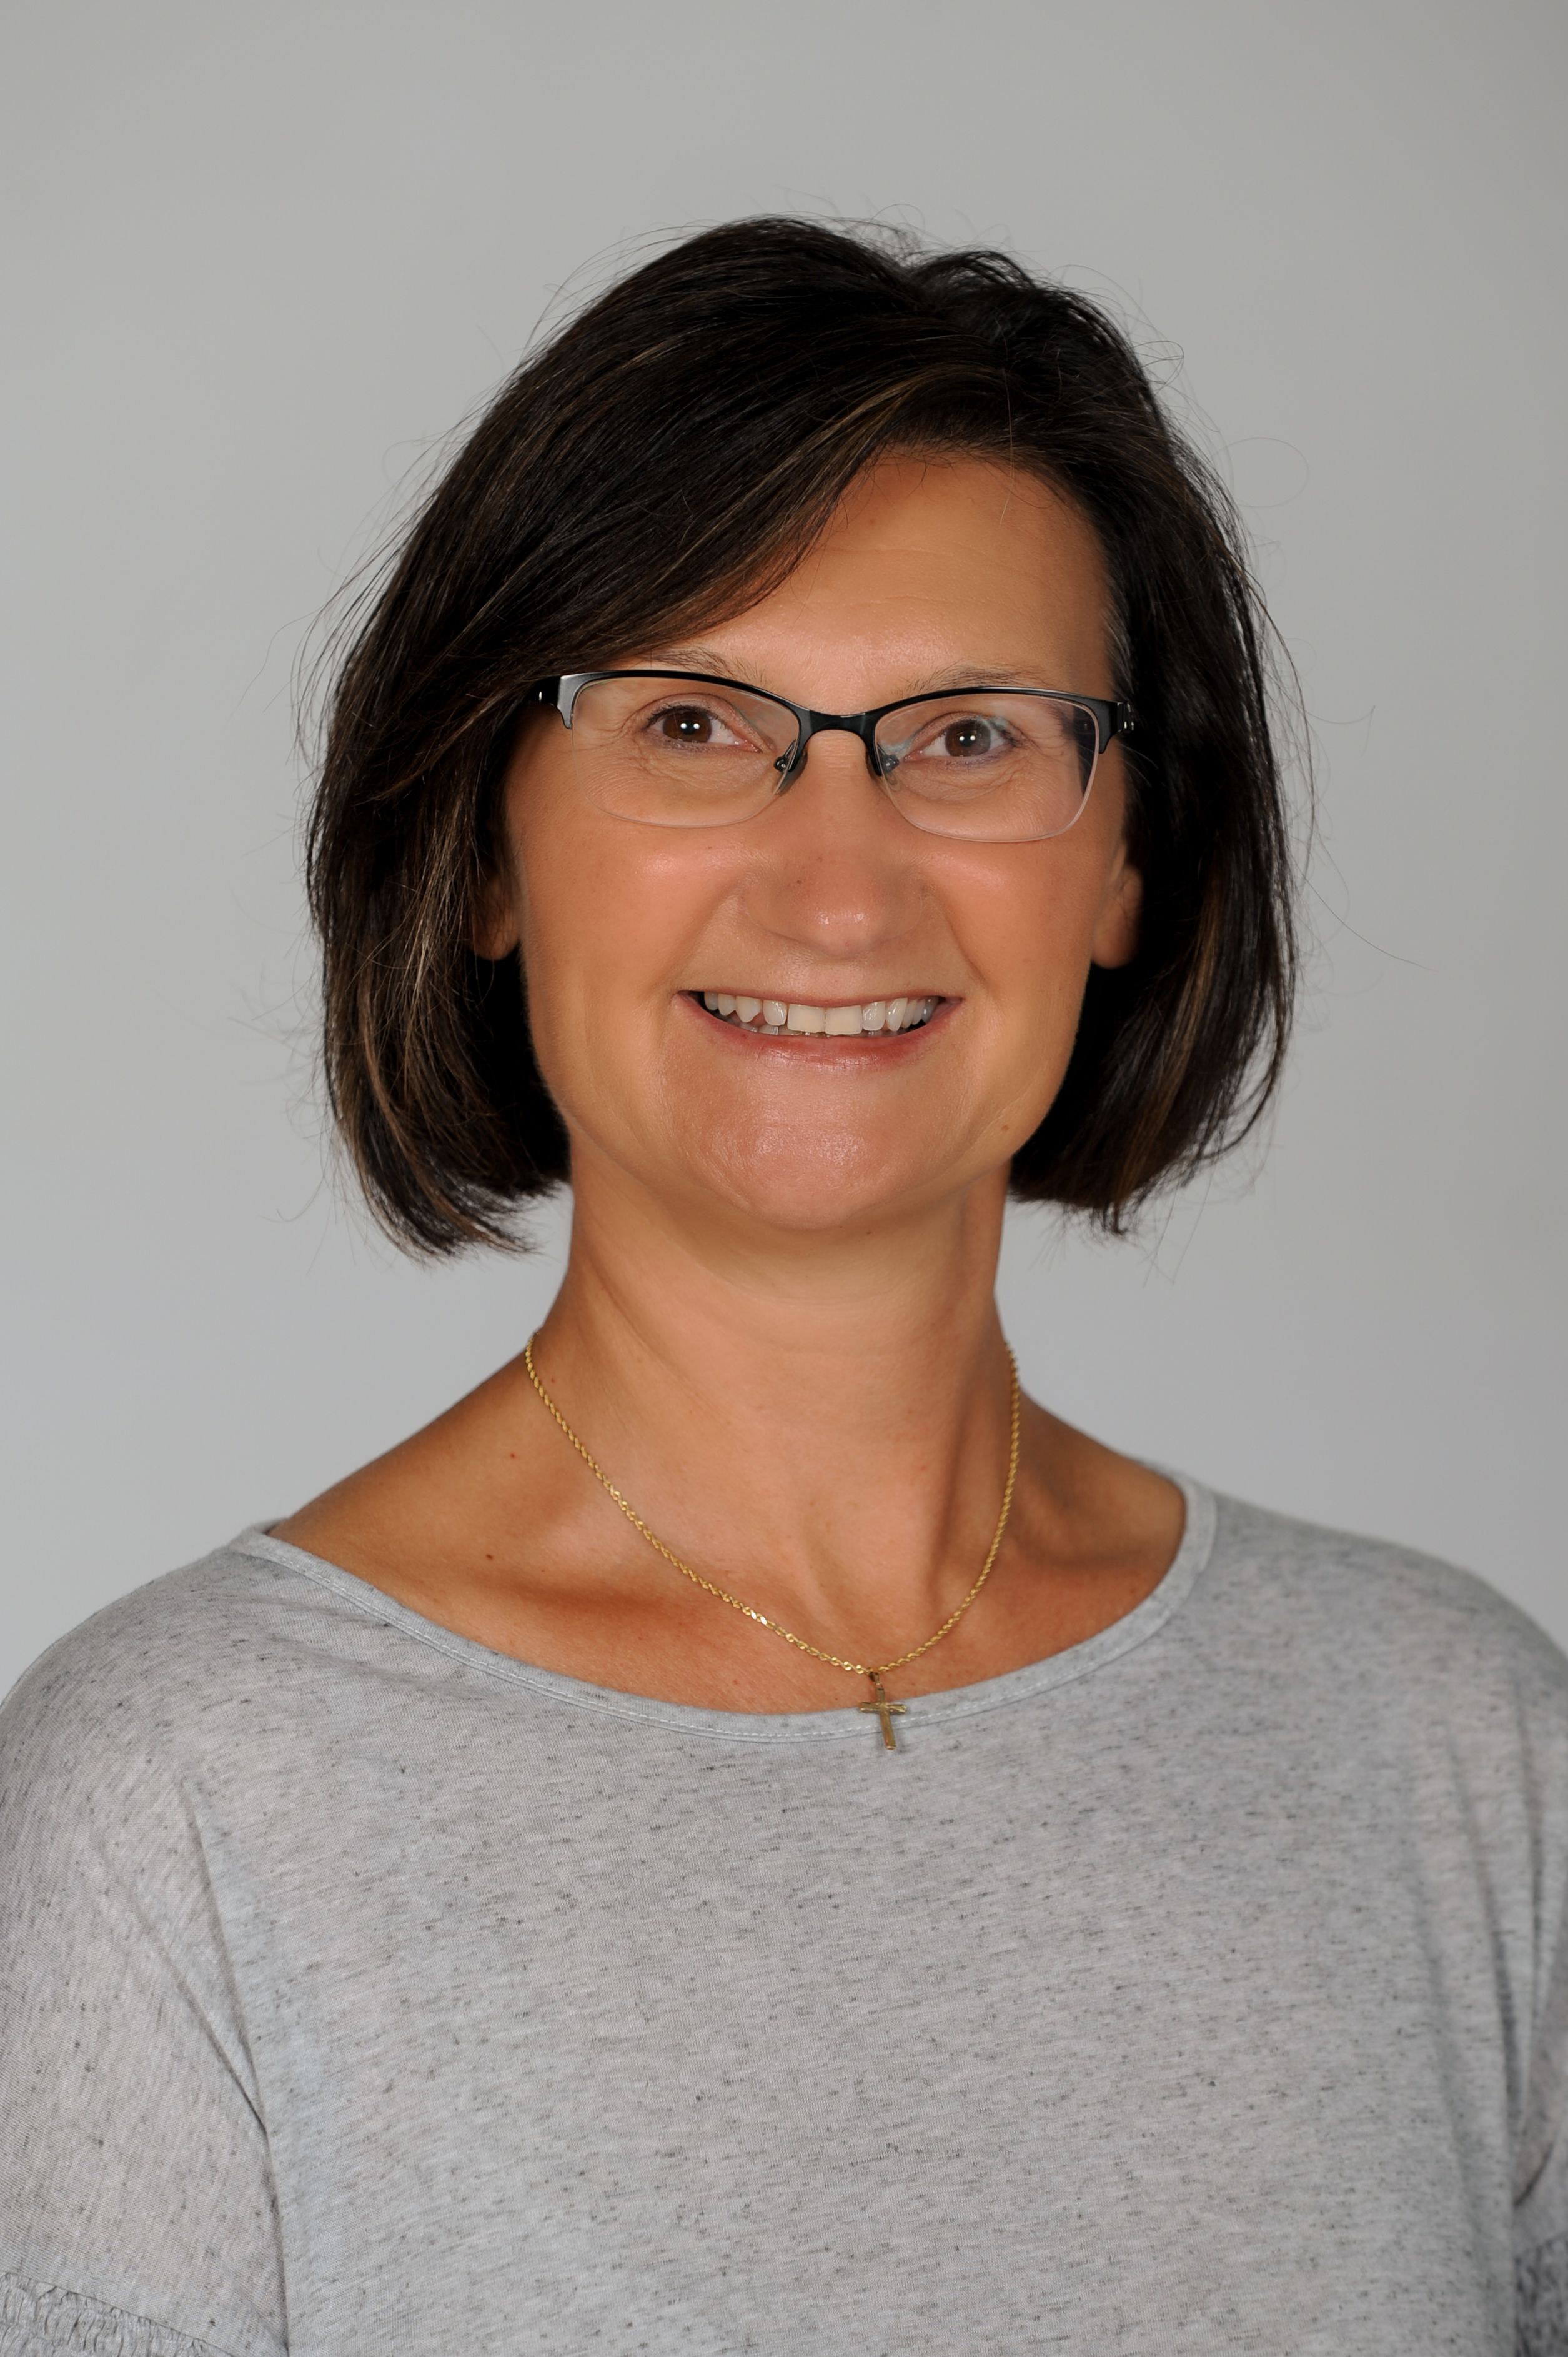 Irene Nerbonne